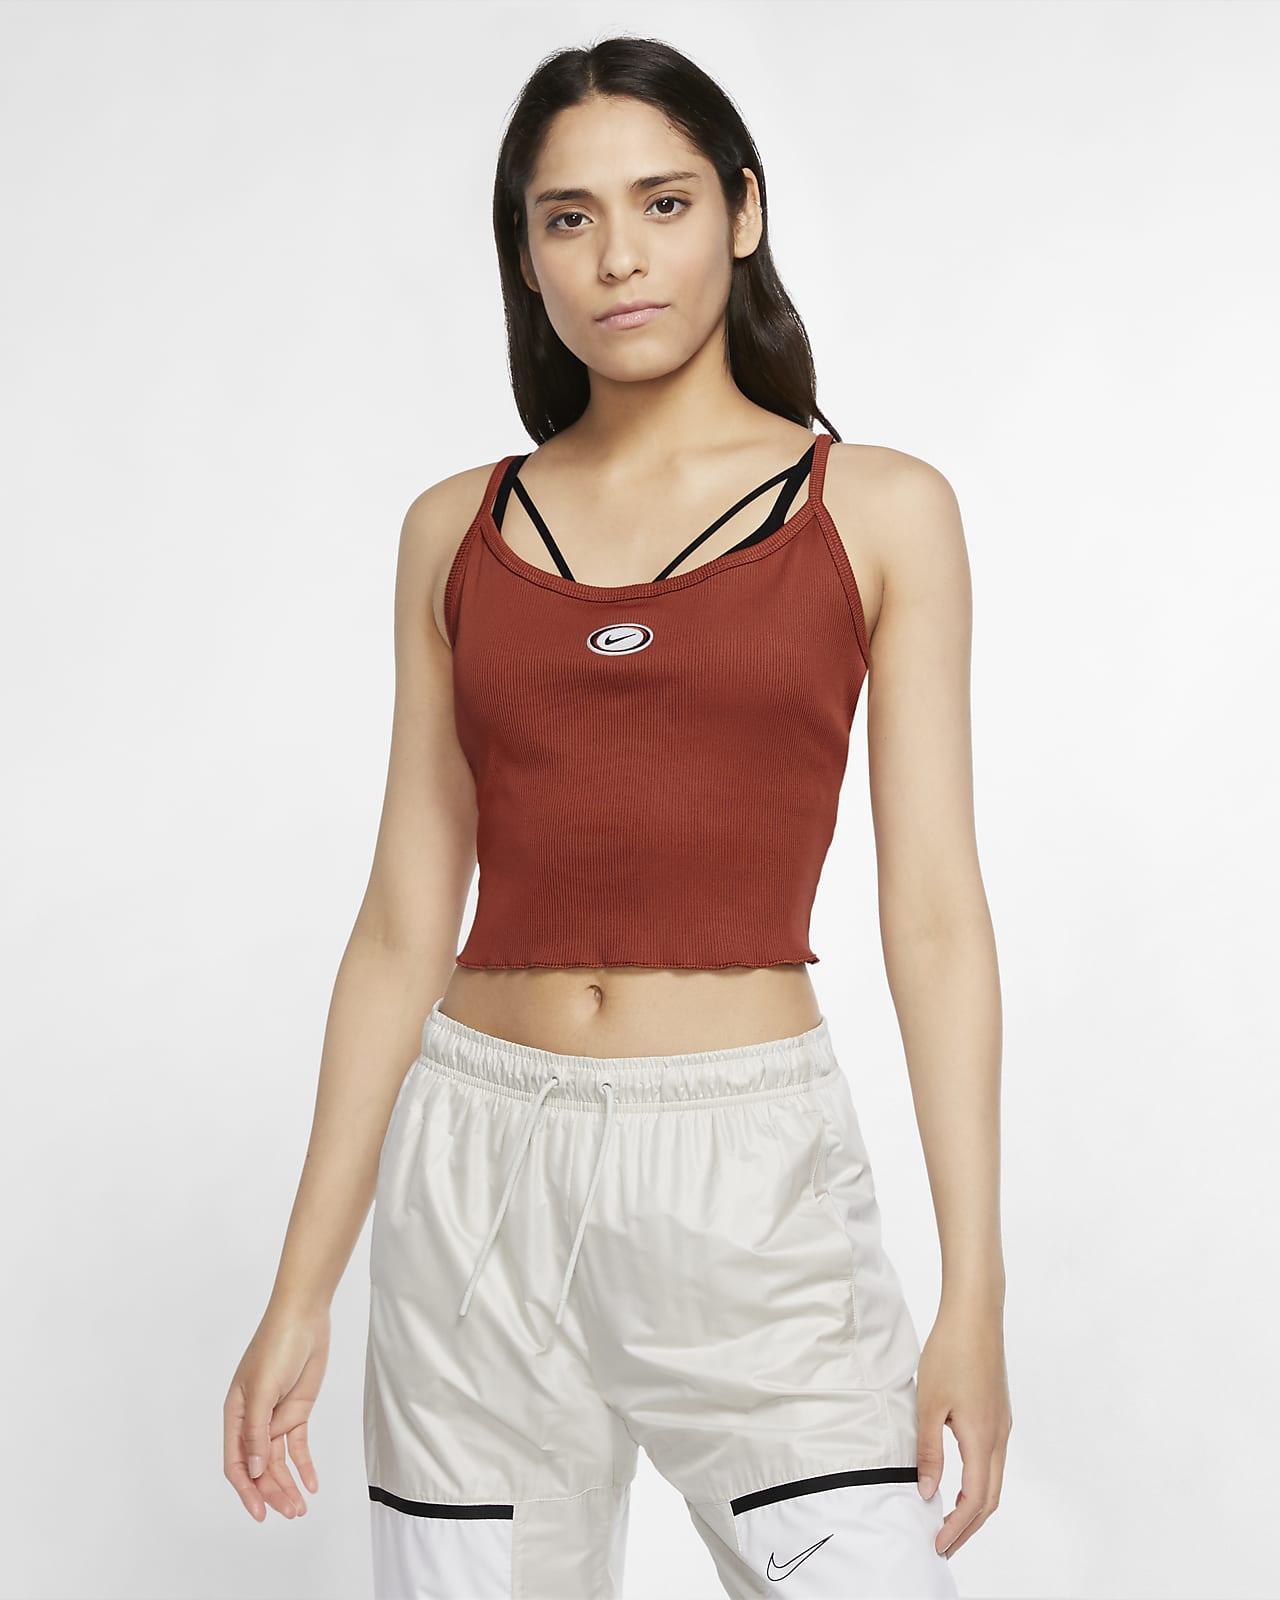 Nike Sportswear avkortet singlet til dame